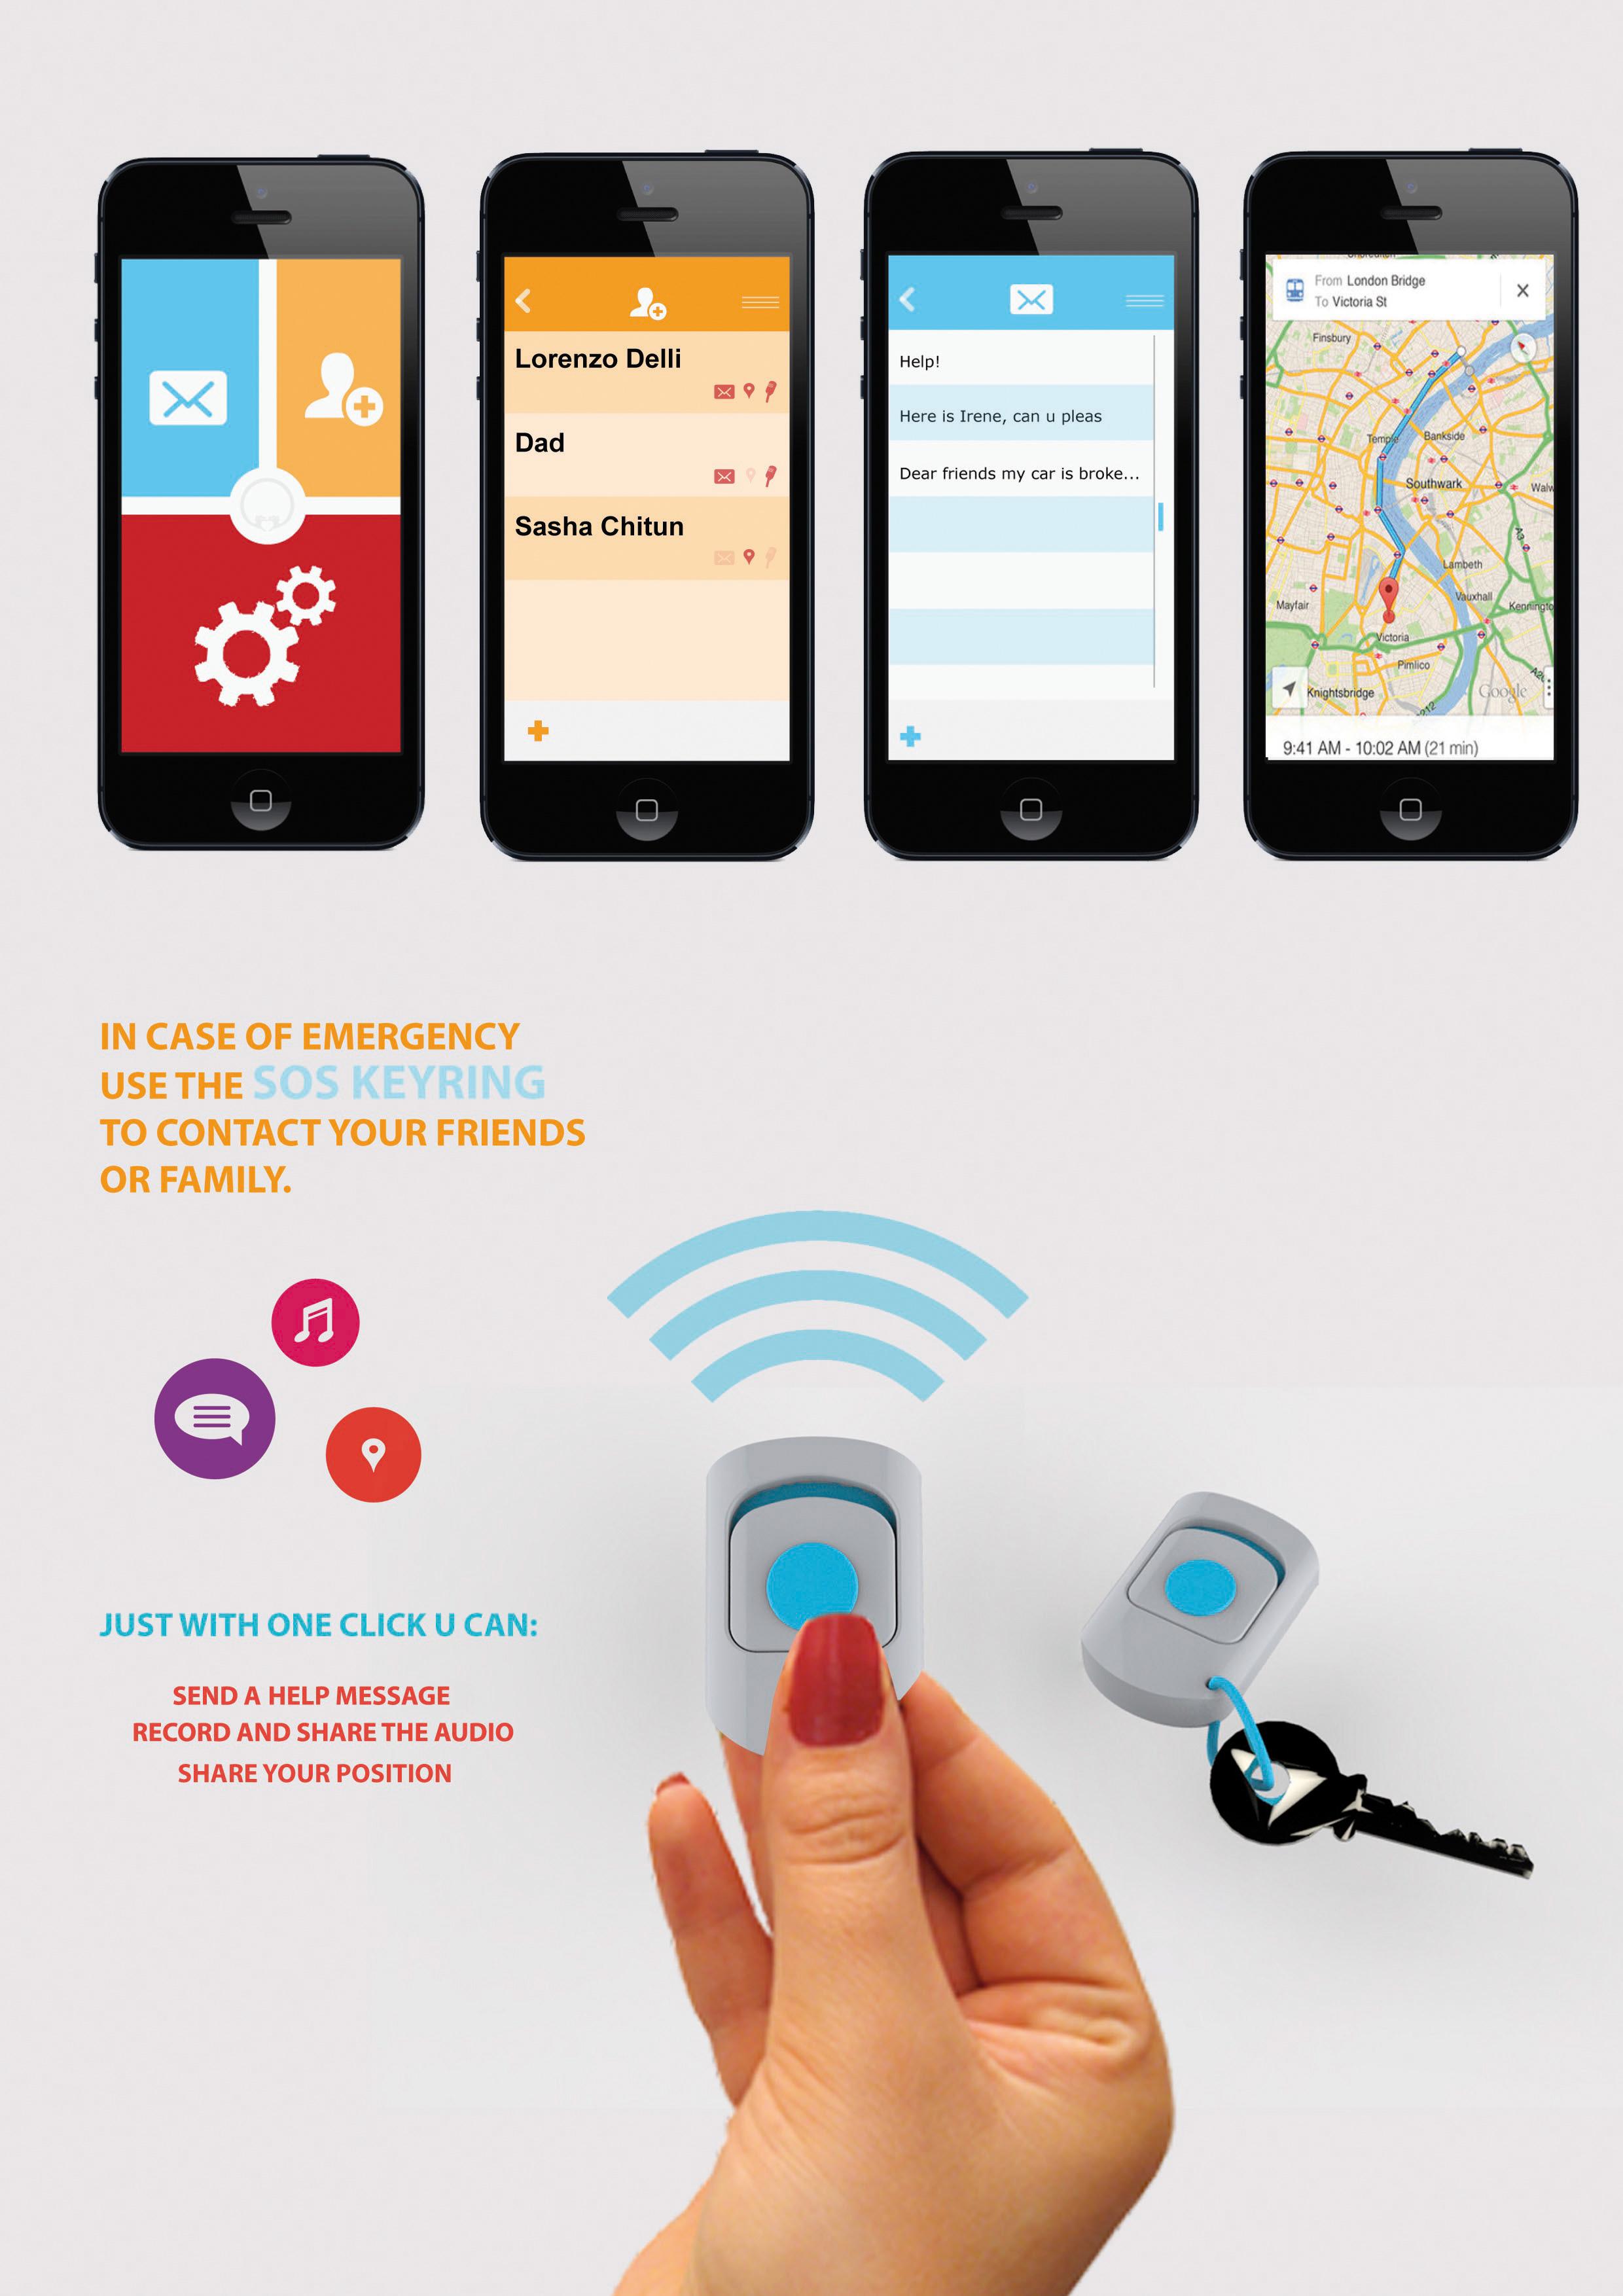 thumbs-up-electronics-sos-keyring_scorpio-worldwide_travel-retail-distributor